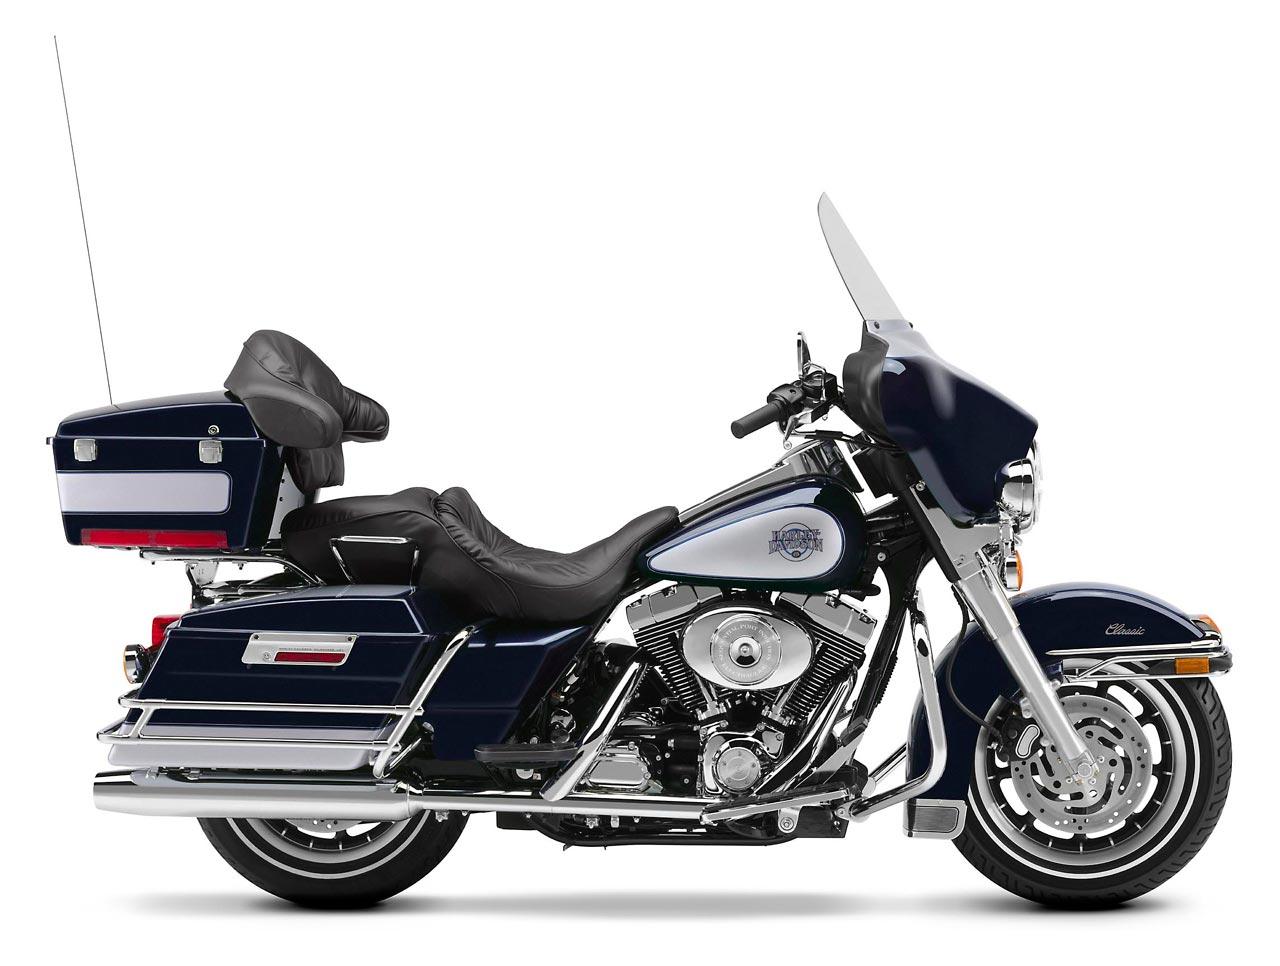 Harley Davidson Flhtci Electra Glide